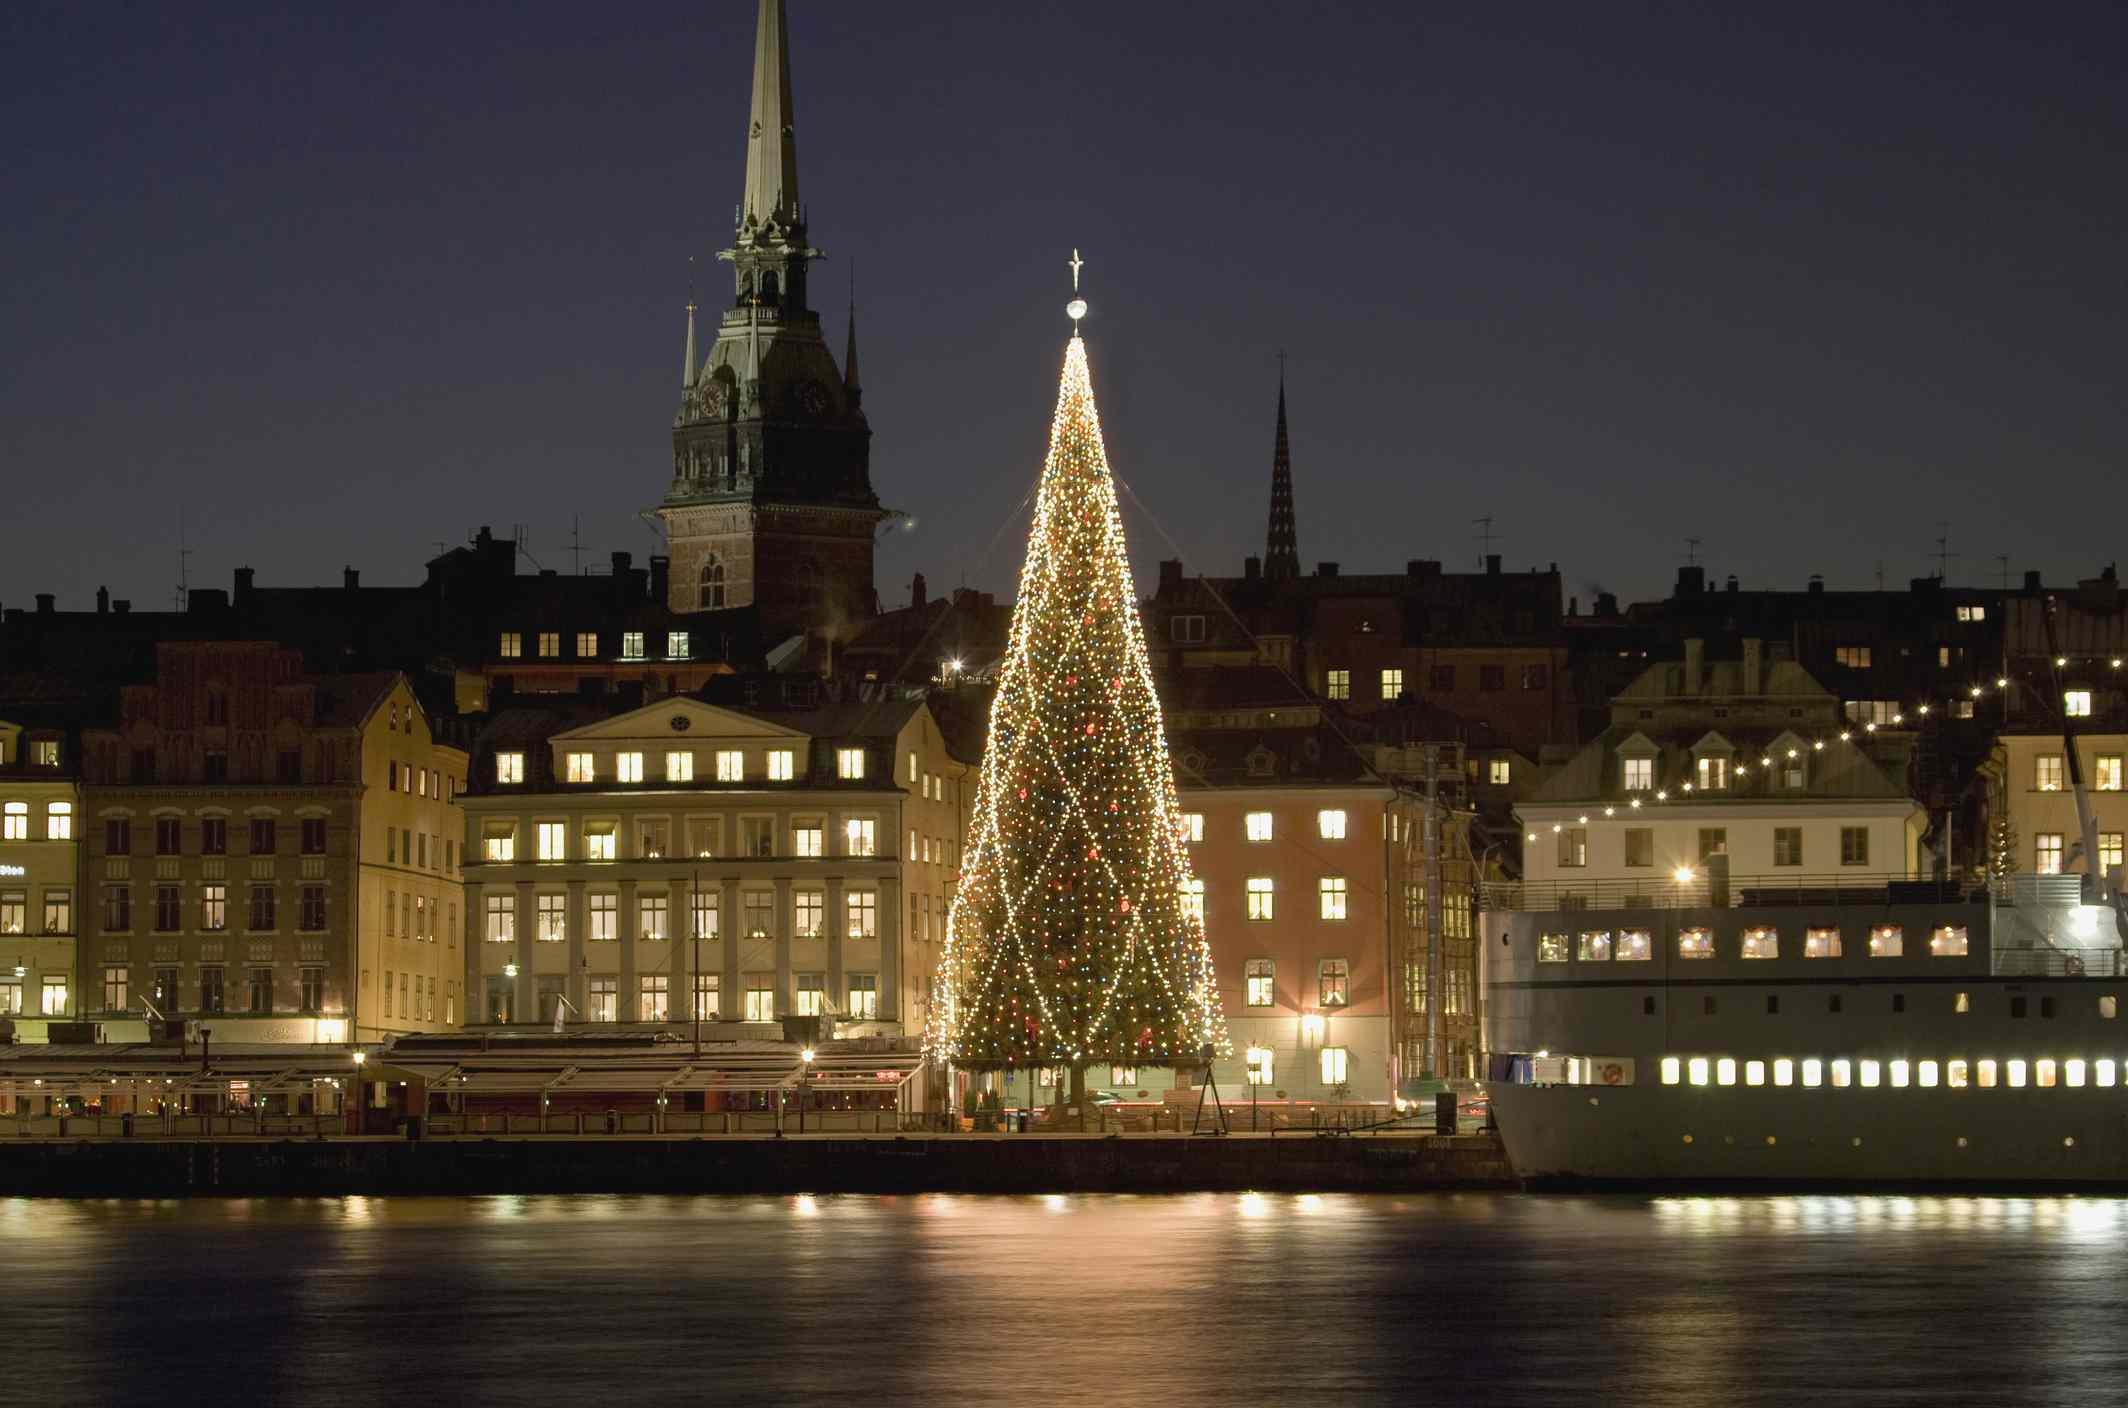 Christmas tree in Stockholm, Sweden